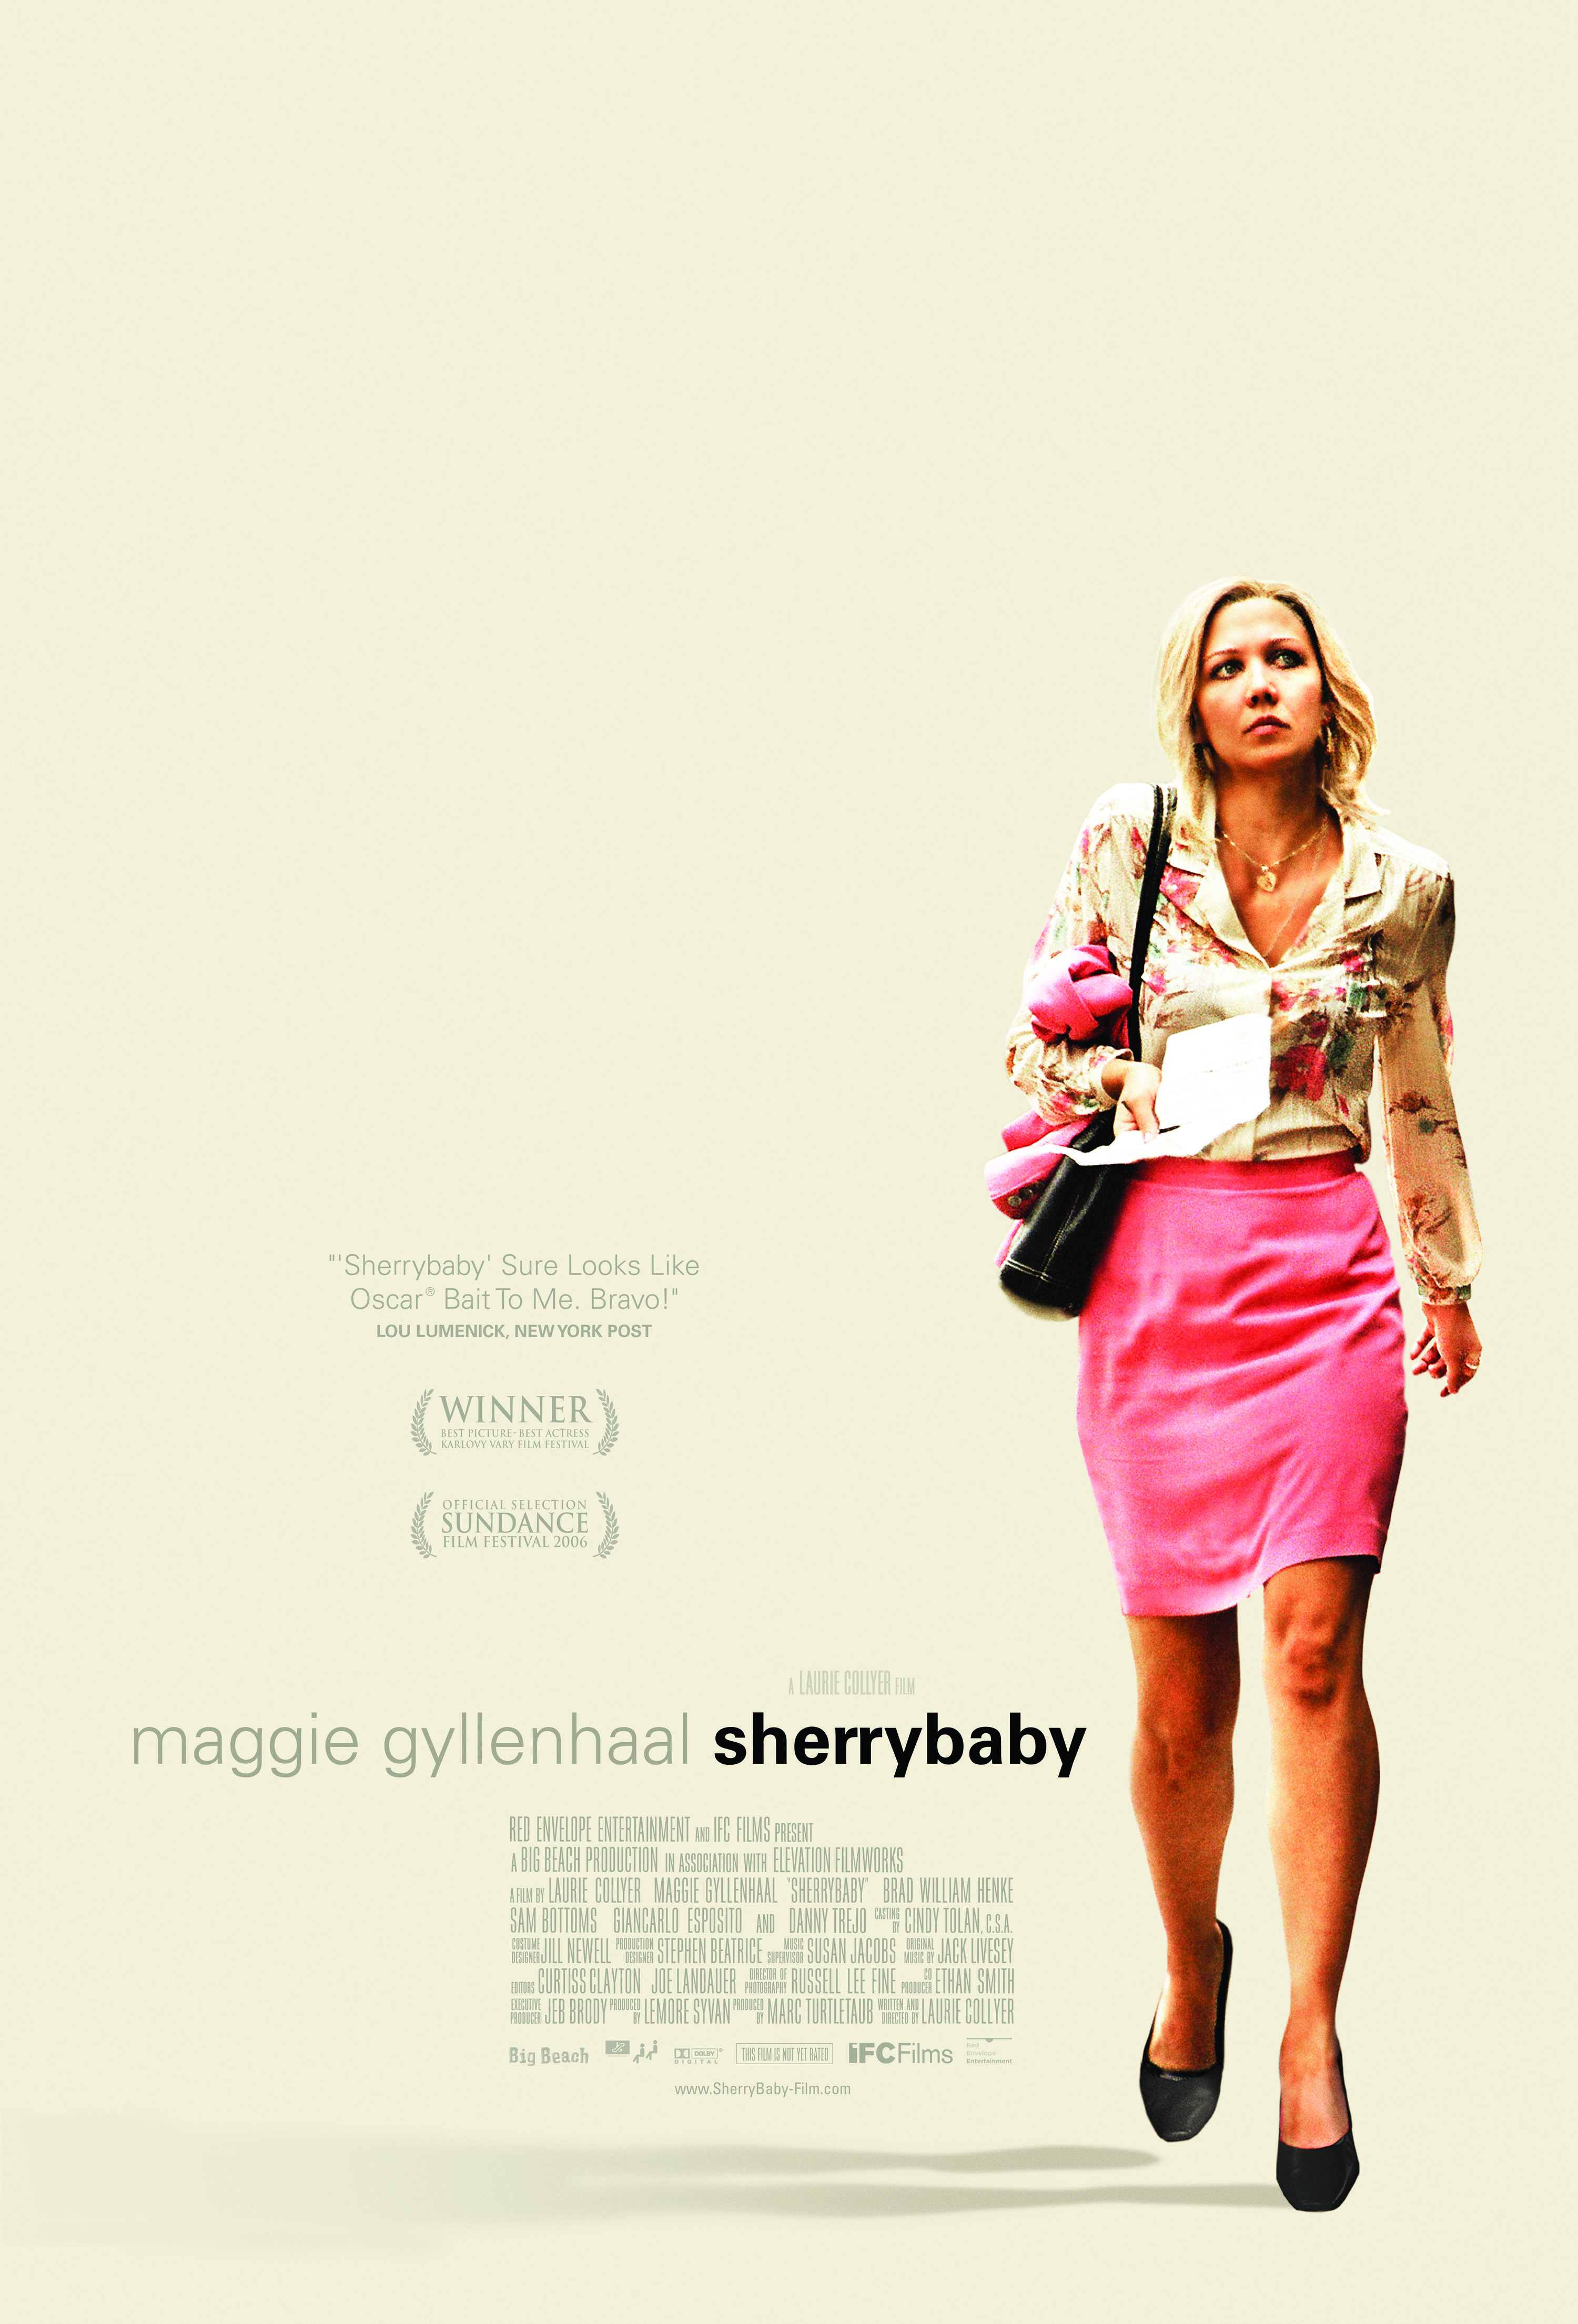 Maggie gyllenhaal sherrybaby sex scene